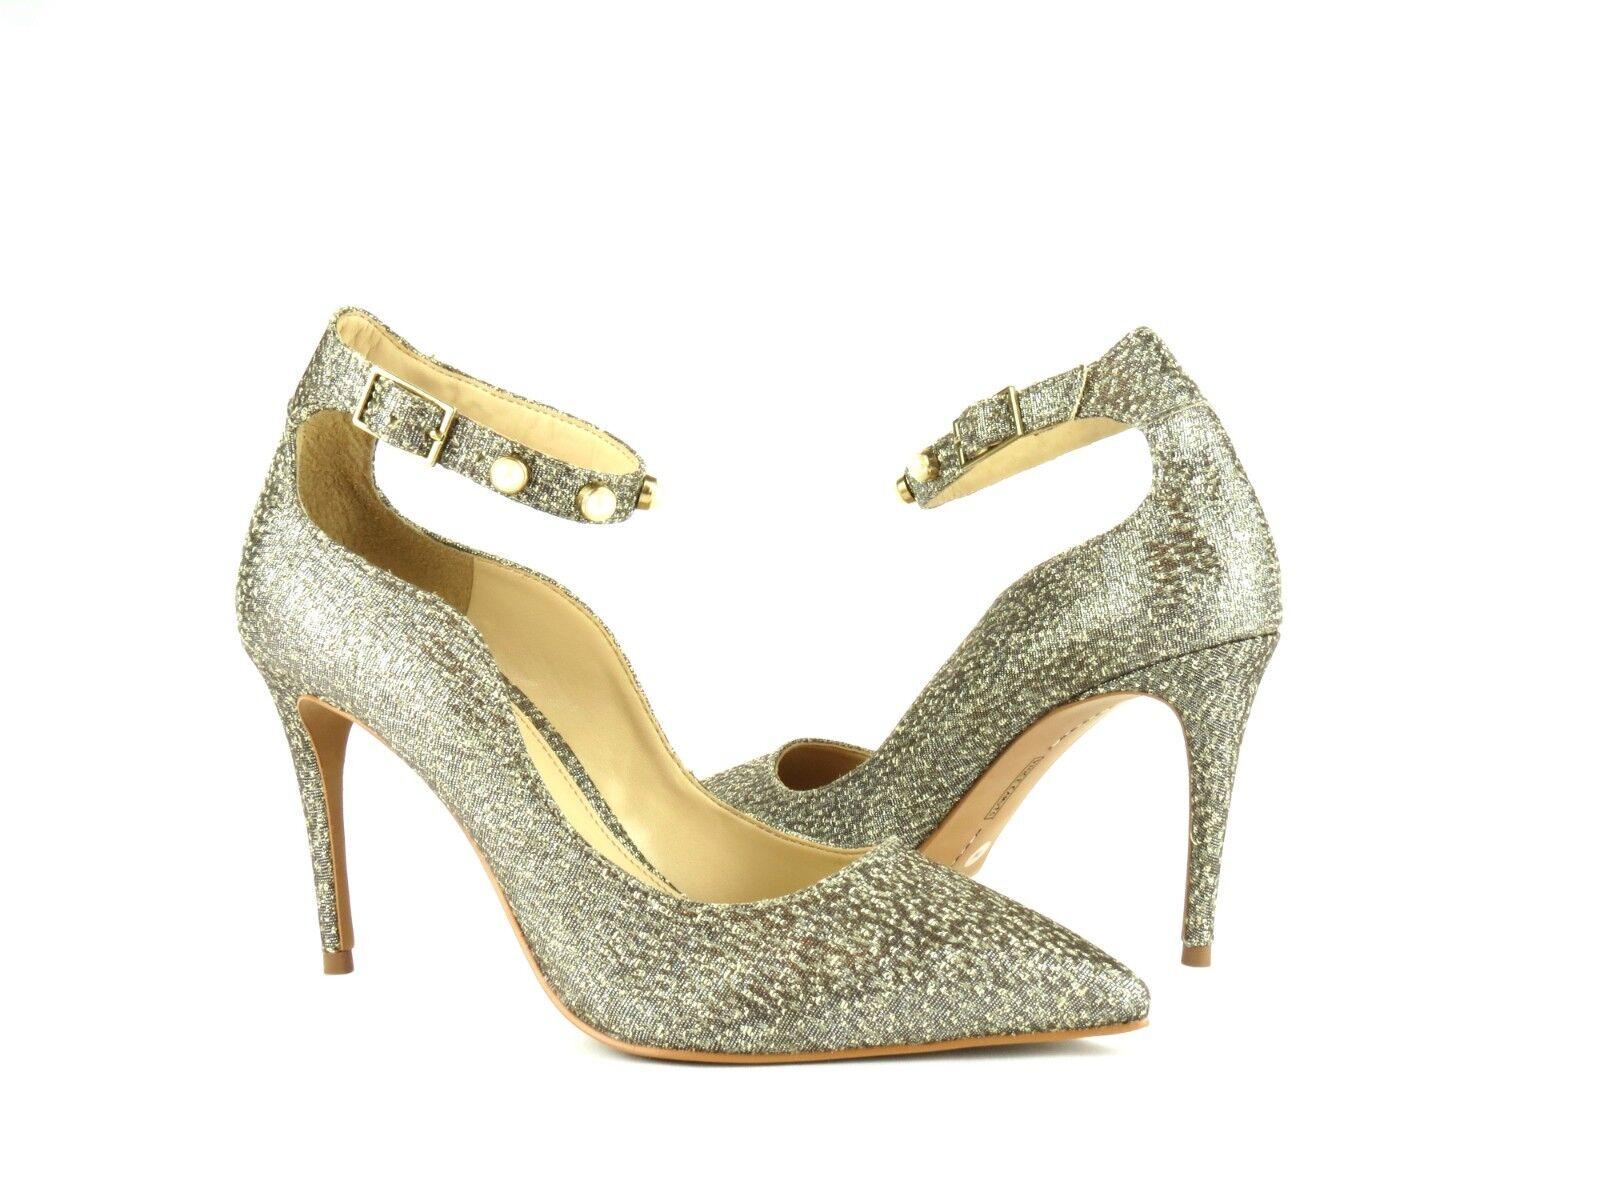 risparmia fino al 70% Vince Vince Vince Camuto Jassita Bronze Metallic Brocade Jeweled Ankle Strap Pump Heel 10  design semplice e generoso